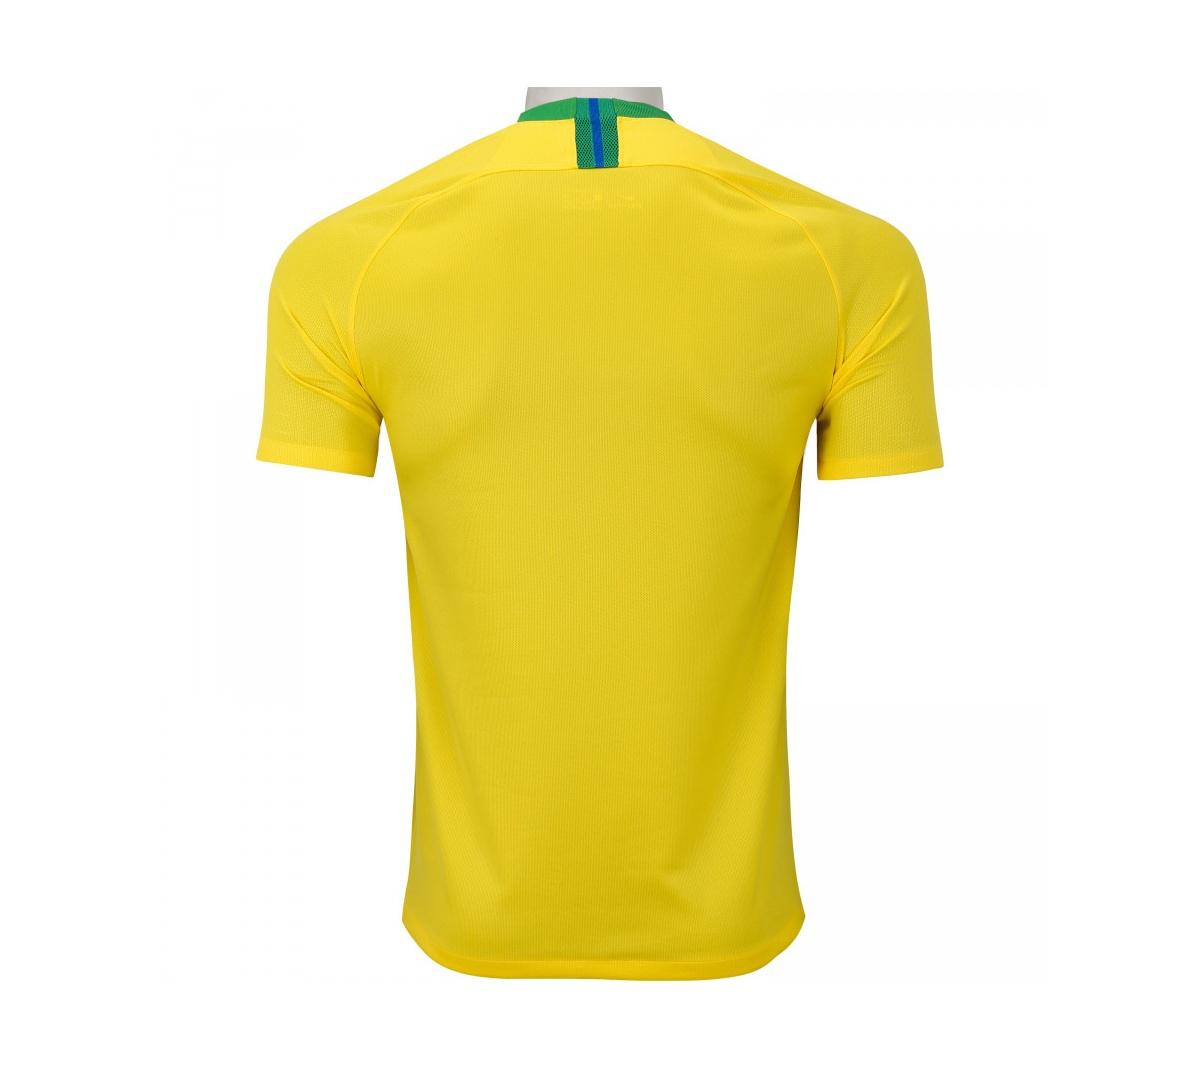 shorts nike brasi 2018 19 torcedor mascu ino a17633a03c8559 ... c94c184b93b1b